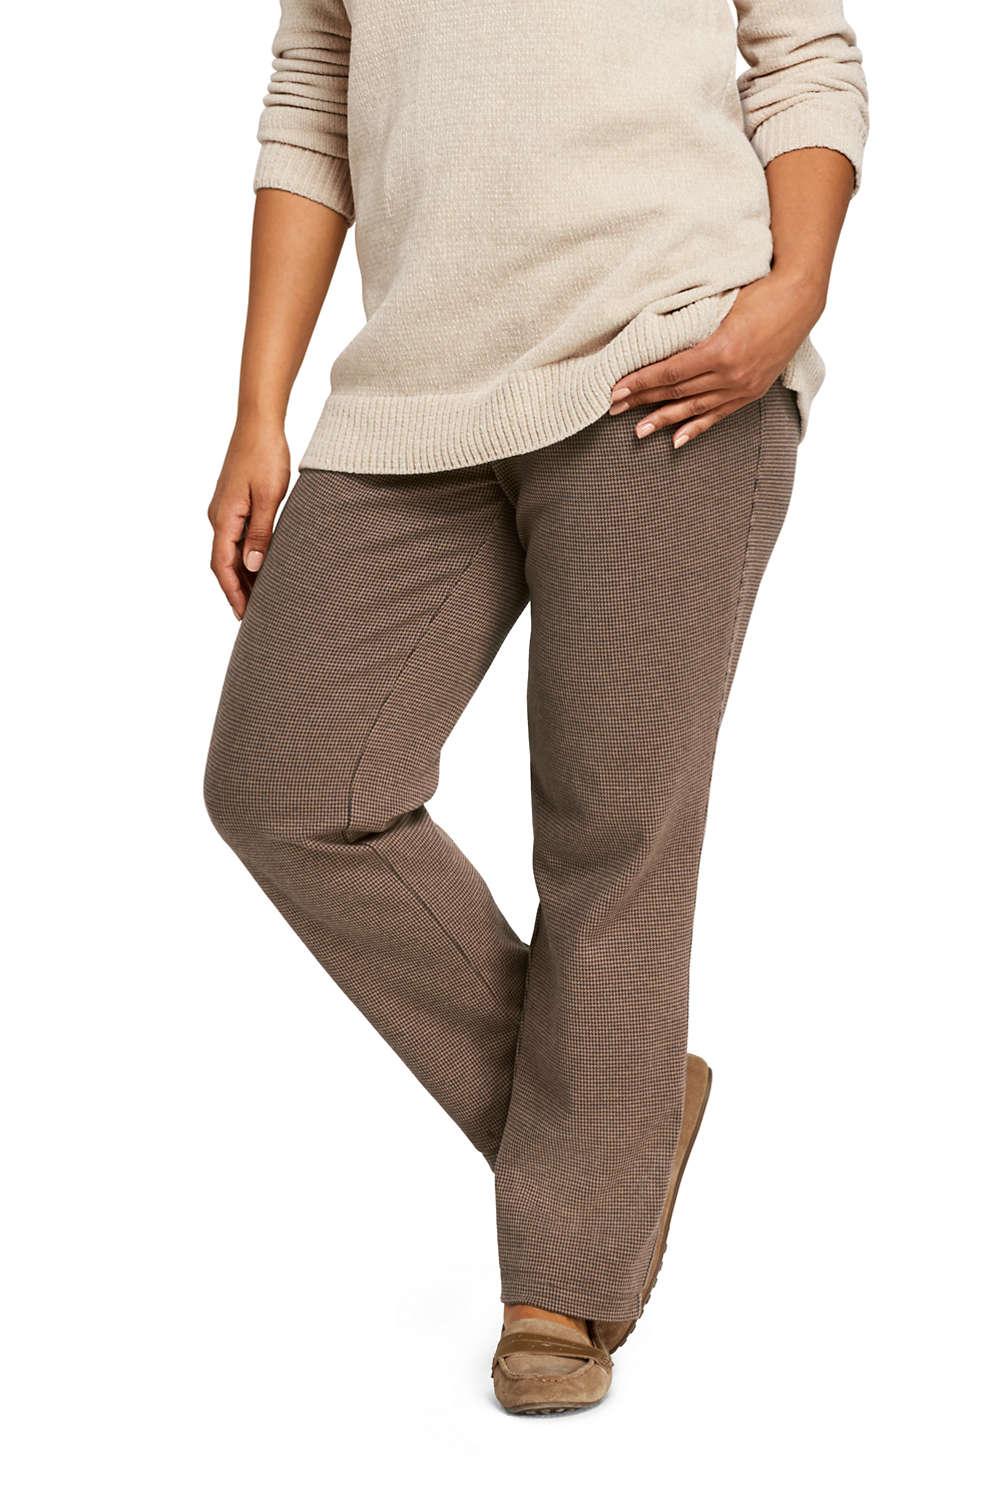 1a5bceb3a29 Women s Plus Size Sport Knit Elastic Waist Pants High Rise Jacquard from  Lands  End